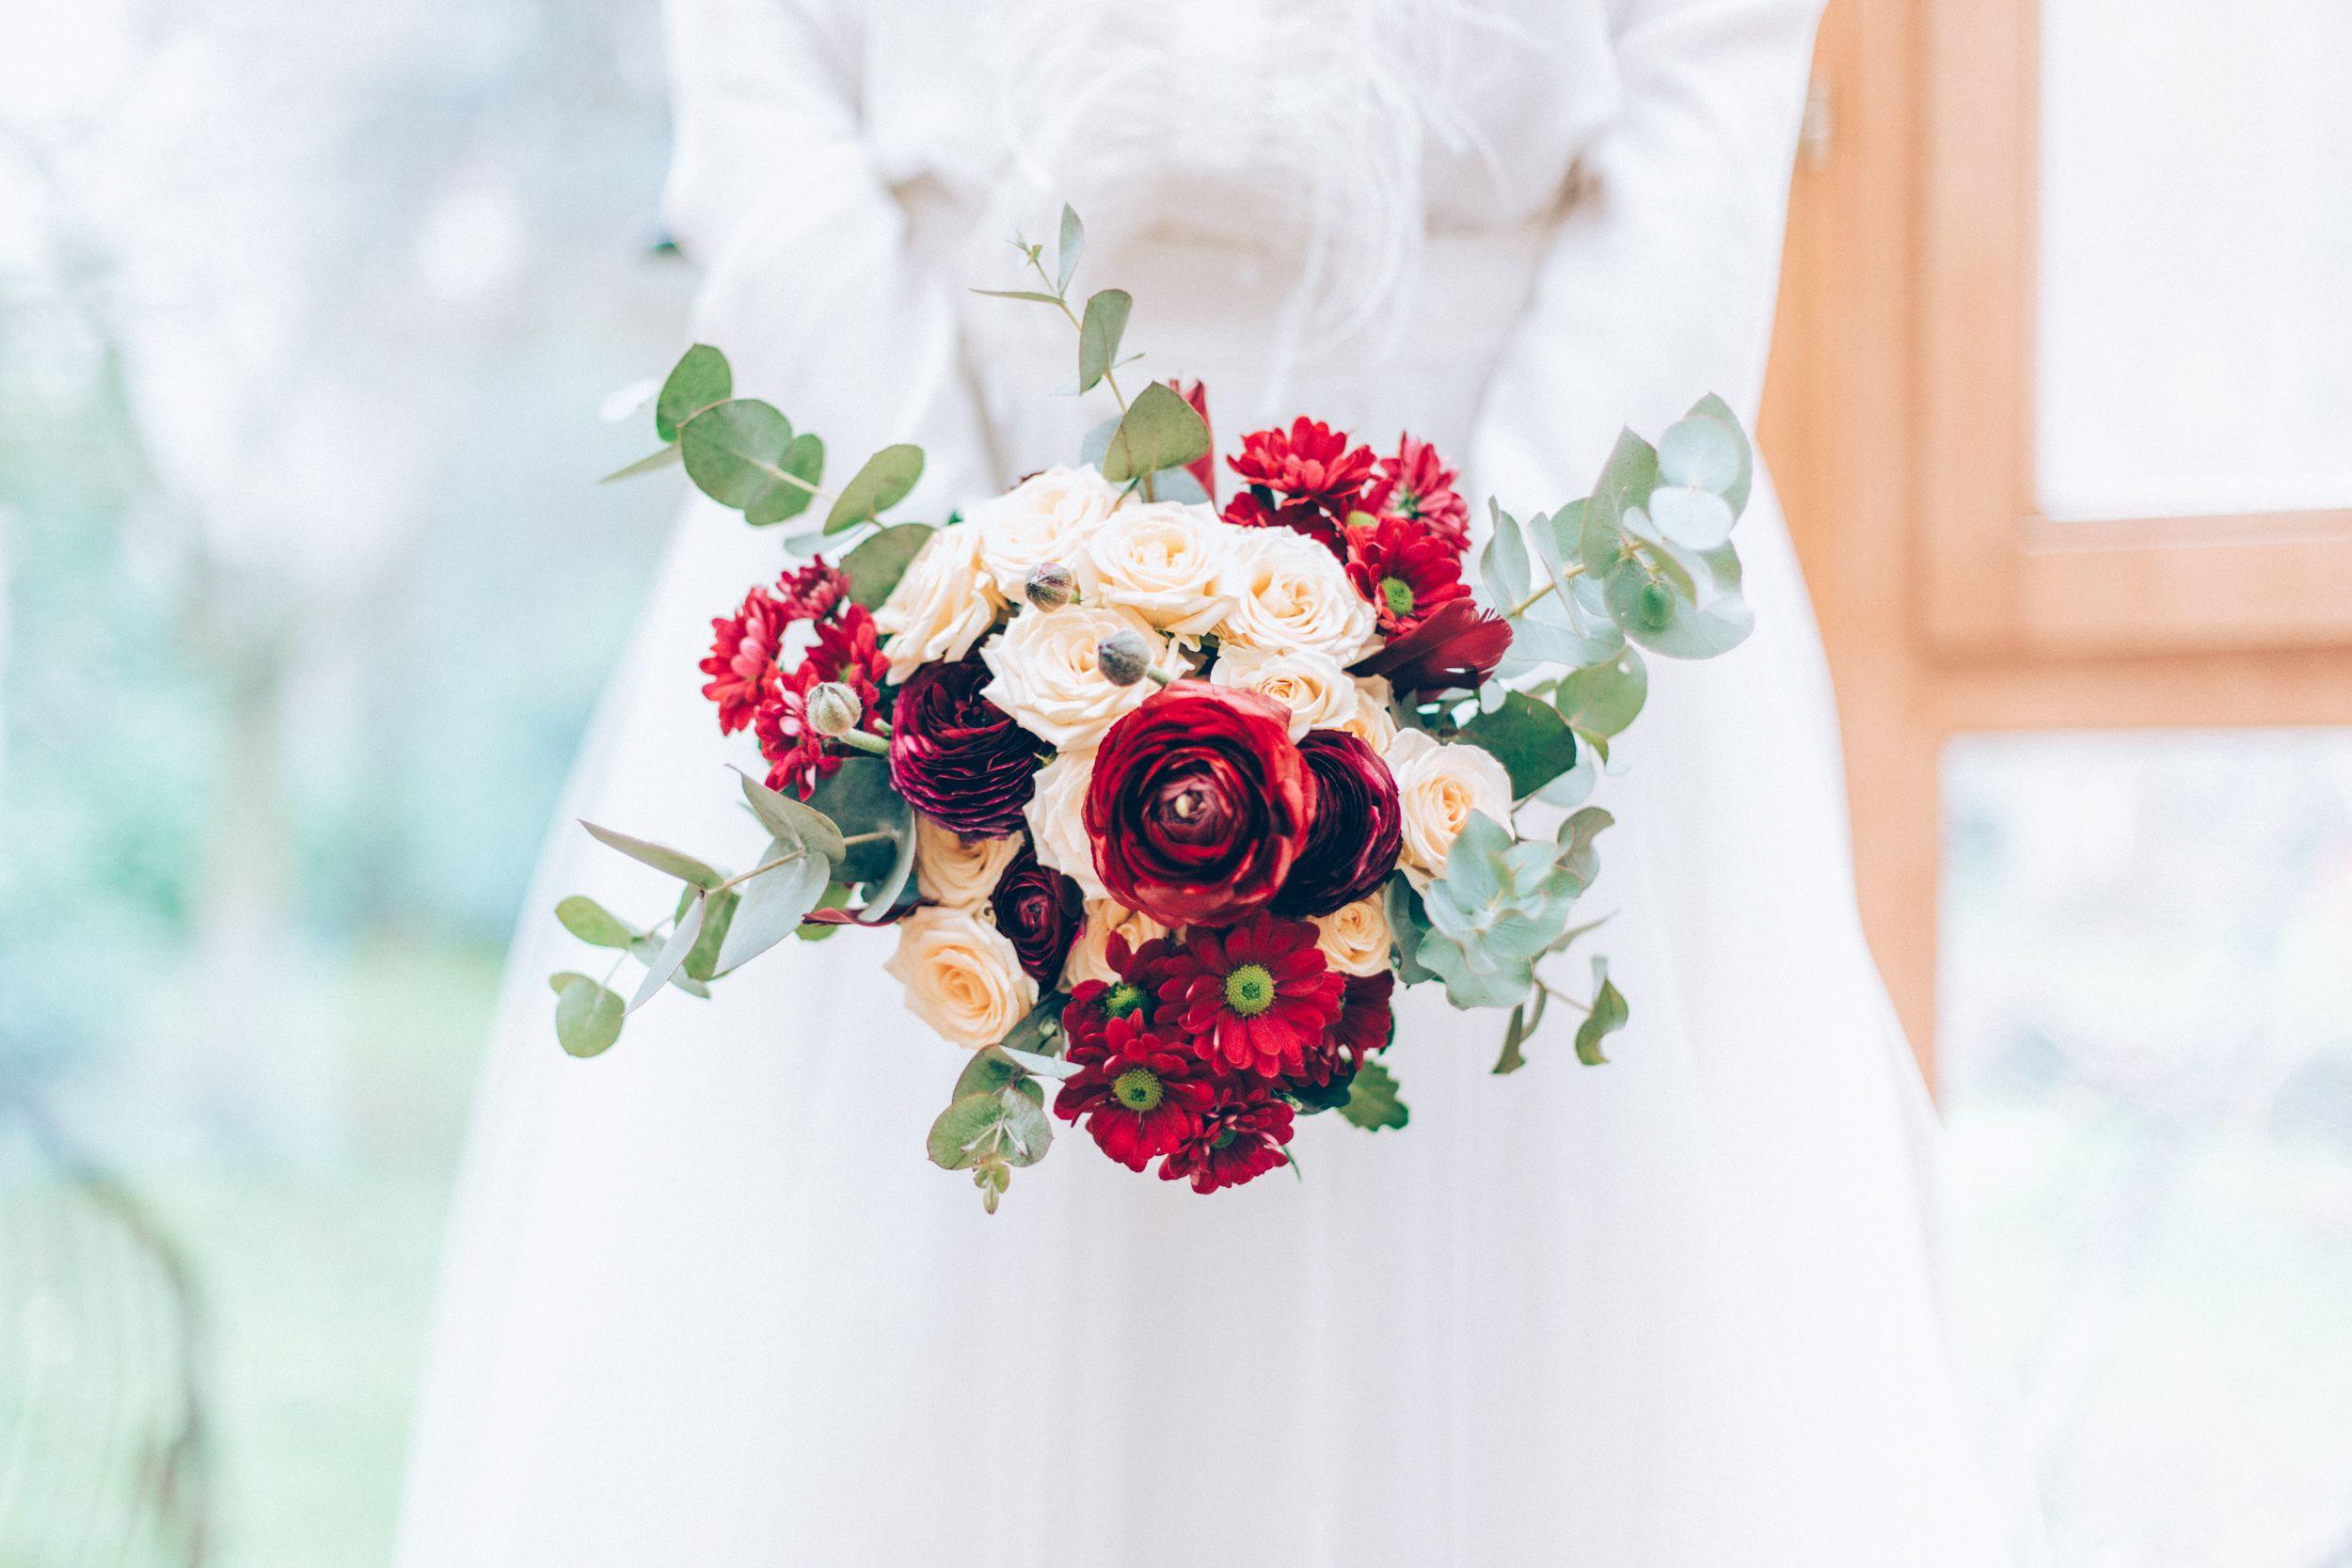 winter wedding bouquet bouquet mari e rouge vert blanc. Black Bedroom Furniture Sets. Home Design Ideas